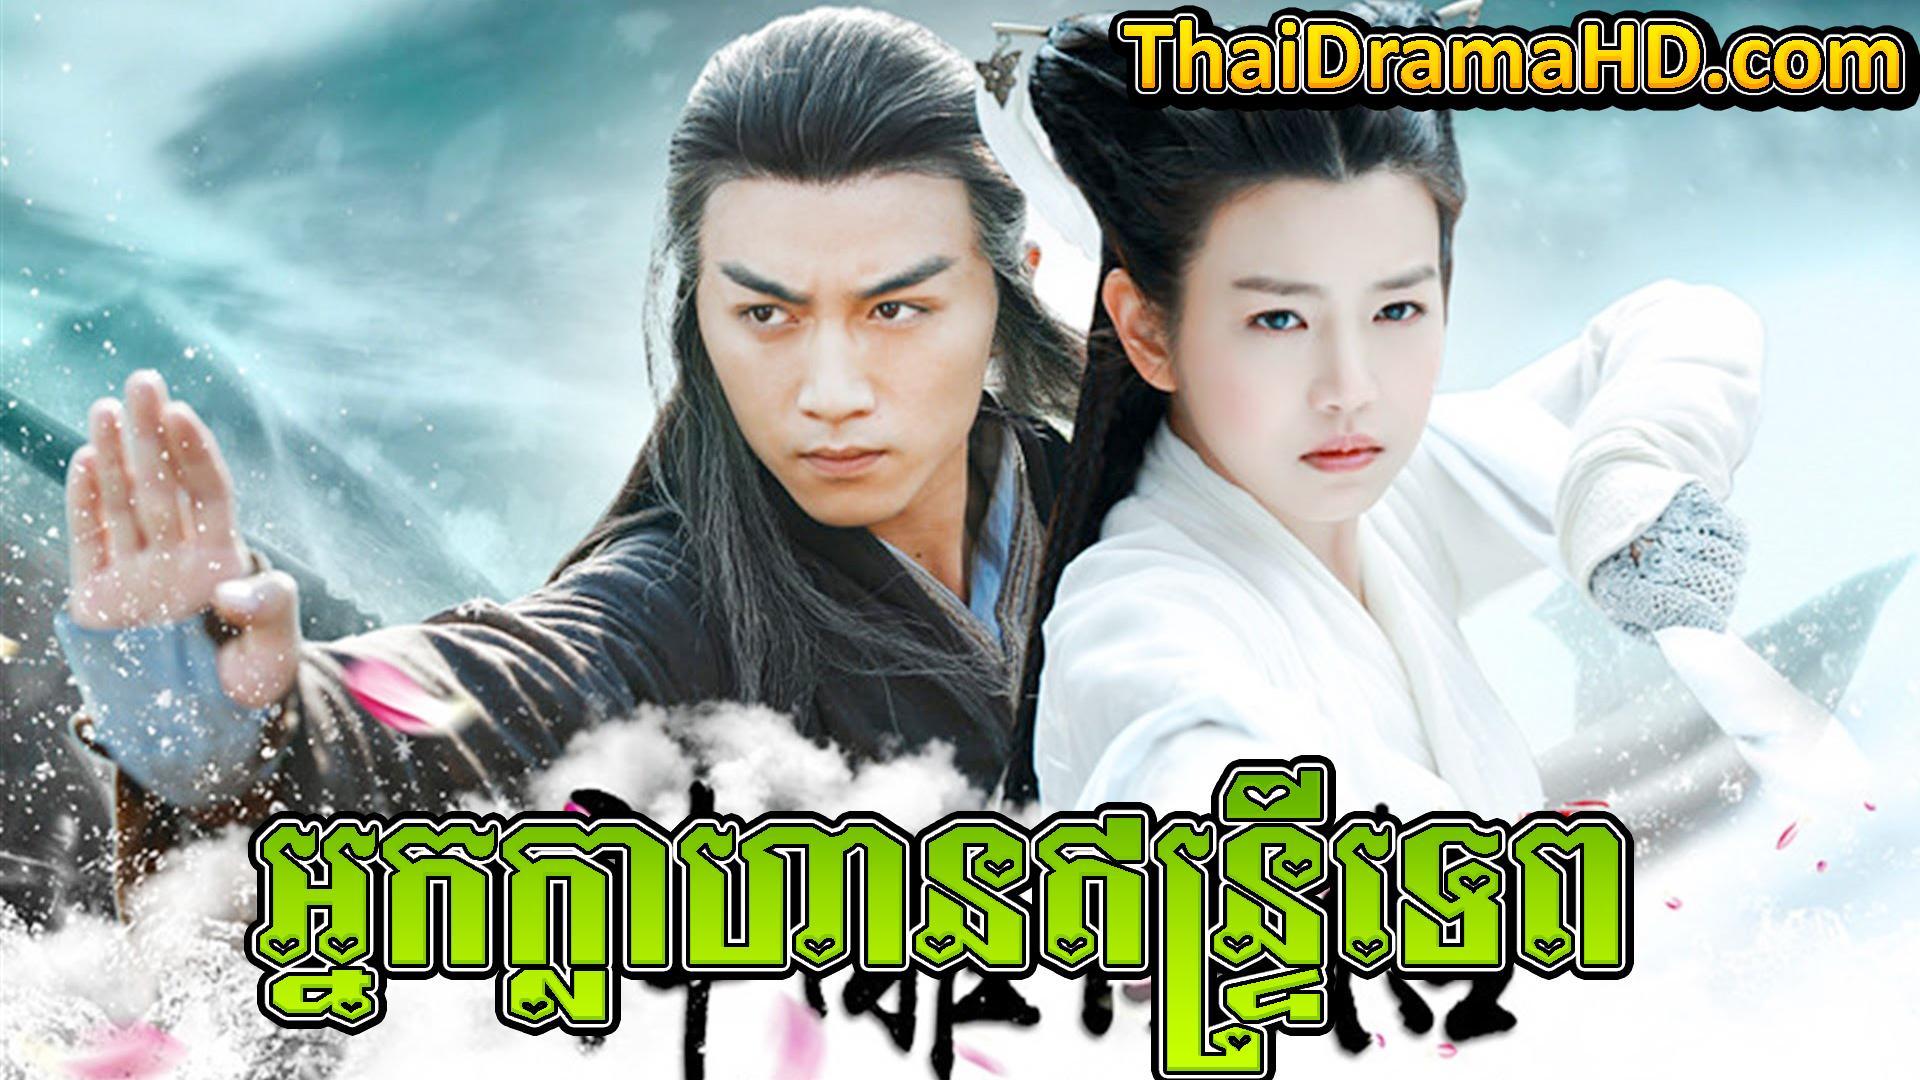 Nak Khlahan Intry Tep | Thai Drama | Thai Drama HD | Khmer Movie | Phumikhmer | Phumikhmer1 | movie-khmer | video4khmer | khmotions | kolabkhmer | khmer drama | ksdrama | cookingtips | roscheat | khmertimeskh | khmerkomsan | phumi7 | merlkon | film2us | movie2kh | sweetdrama | khmercitylove | khreplay | tvb cambodia drama | ckh7 | srokthai | phumimedia | phumi8 | khmer avenue | khmer search | Soyo | khmerfans